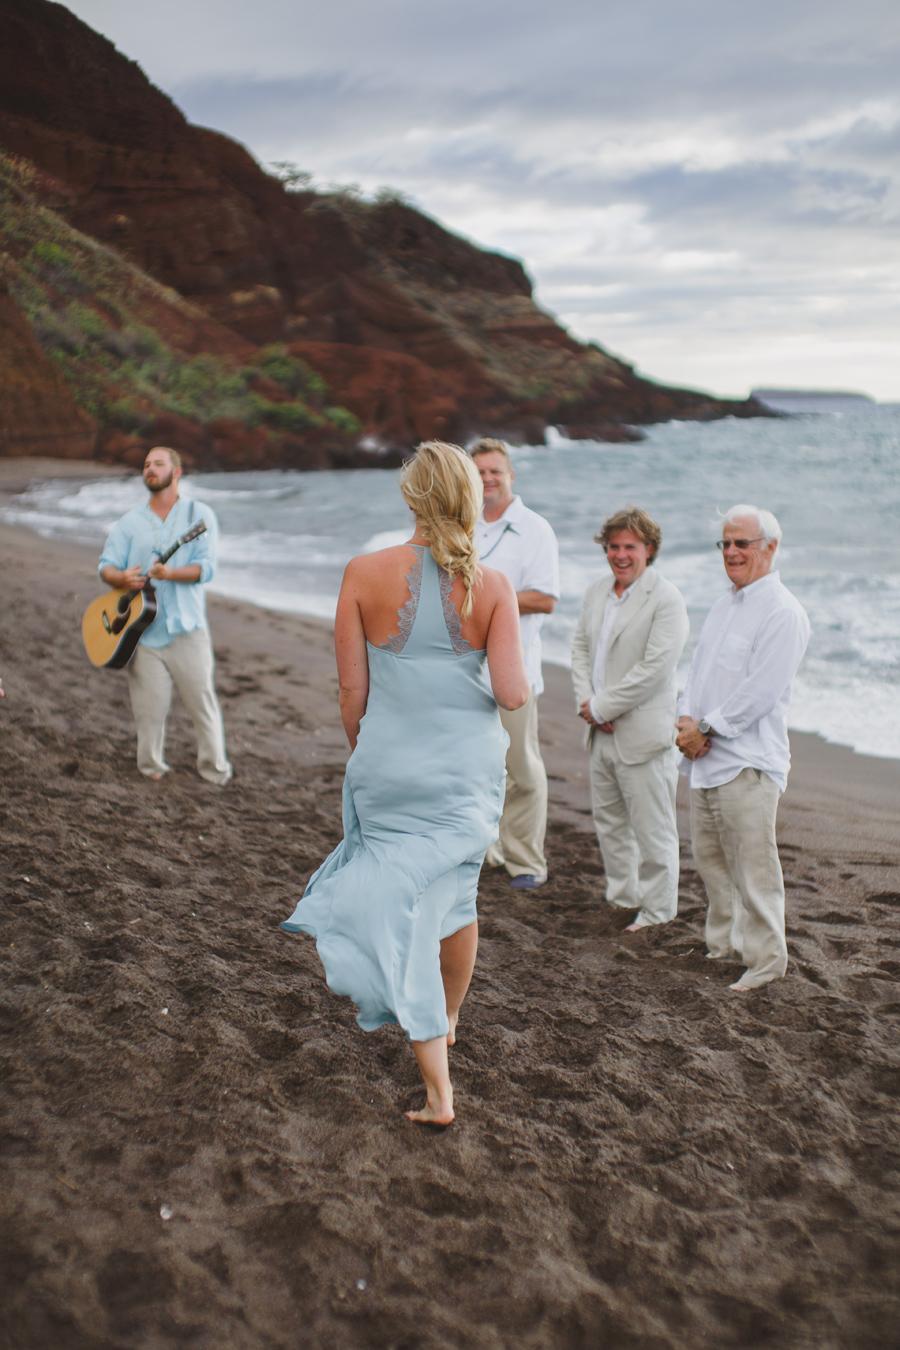 maui beach wedding maid of honor